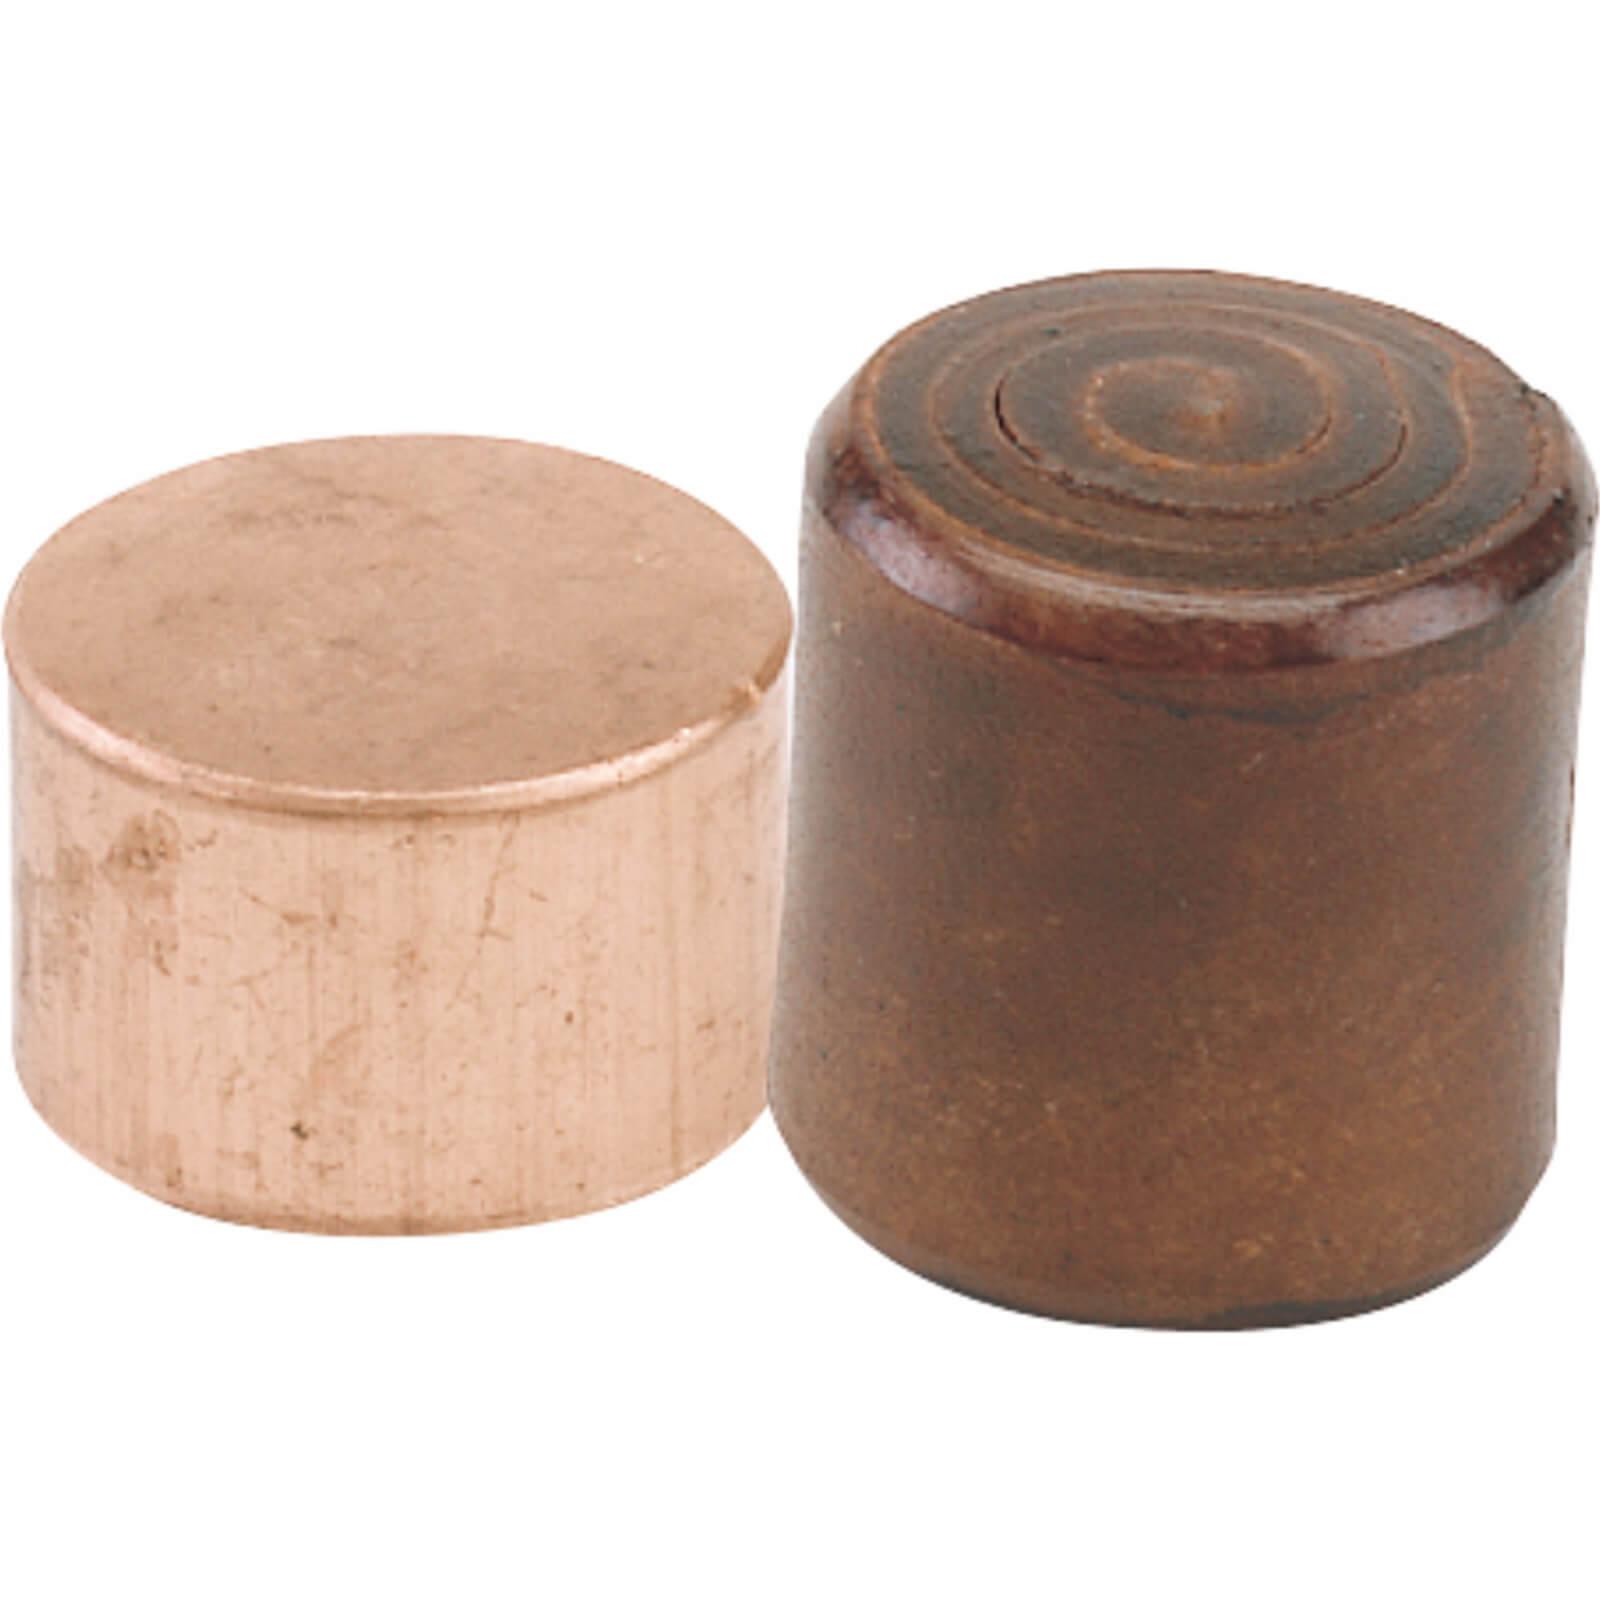 Image of Draper Rawhide Face for Copper Rawhide Hammer